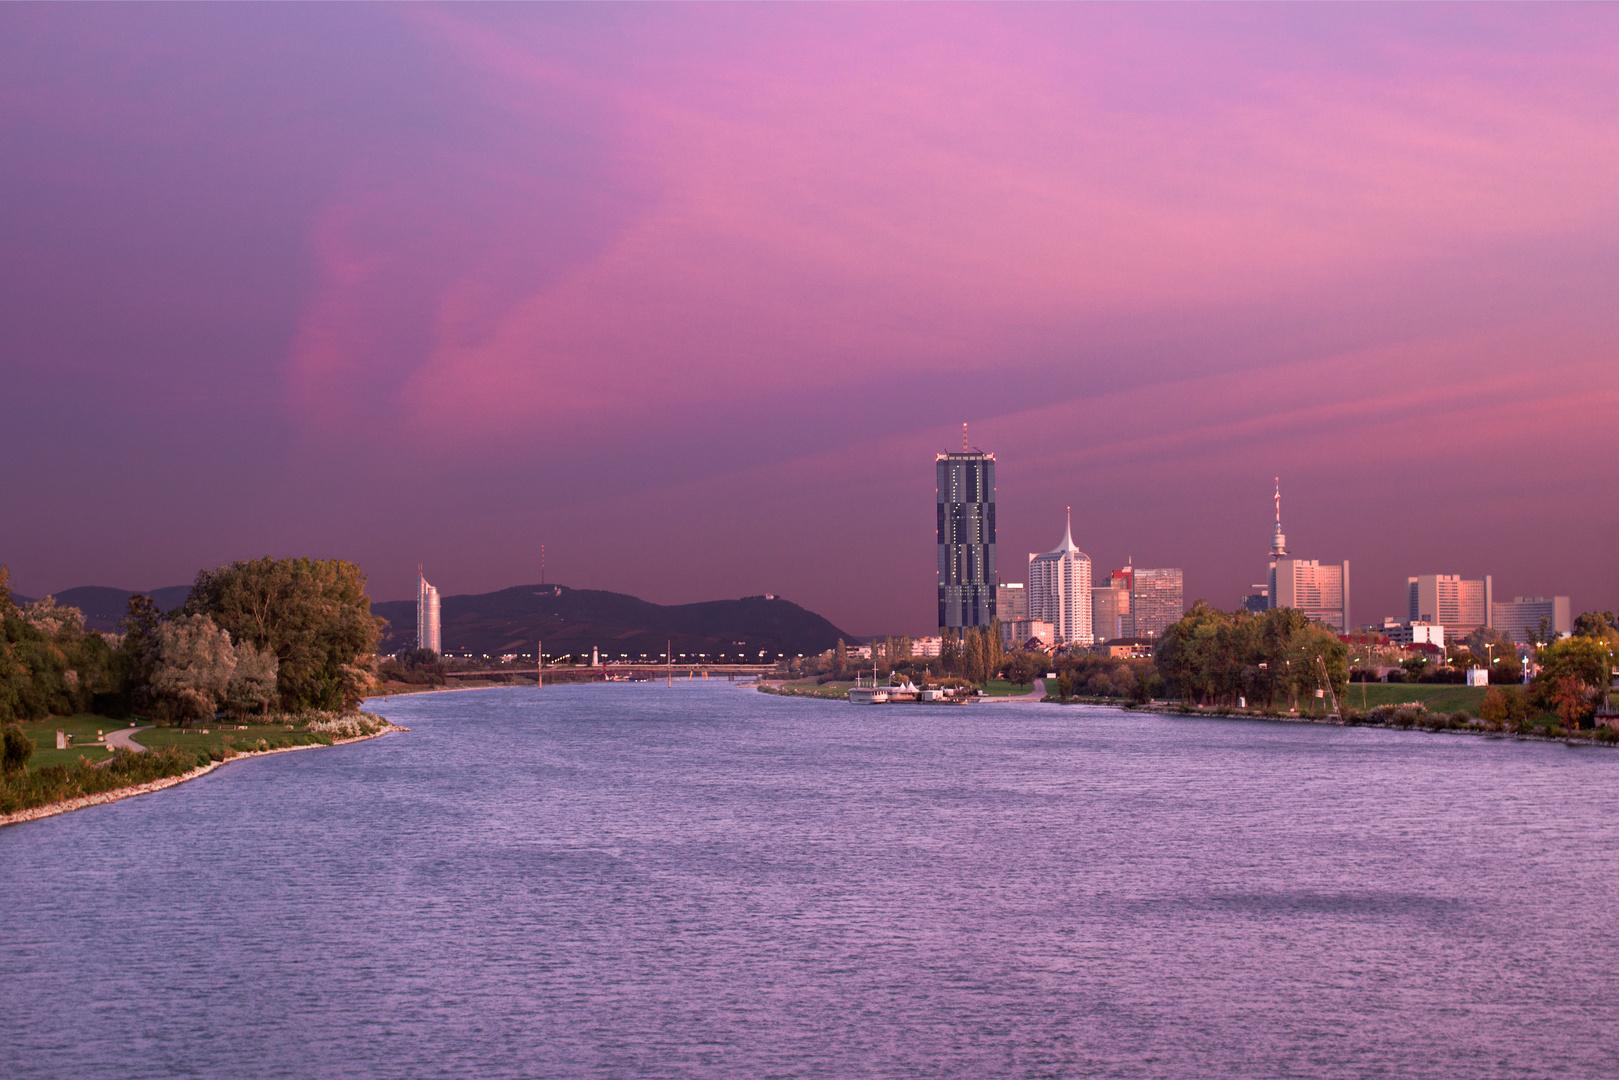 Sonnenaufgang an der Neuen Donau